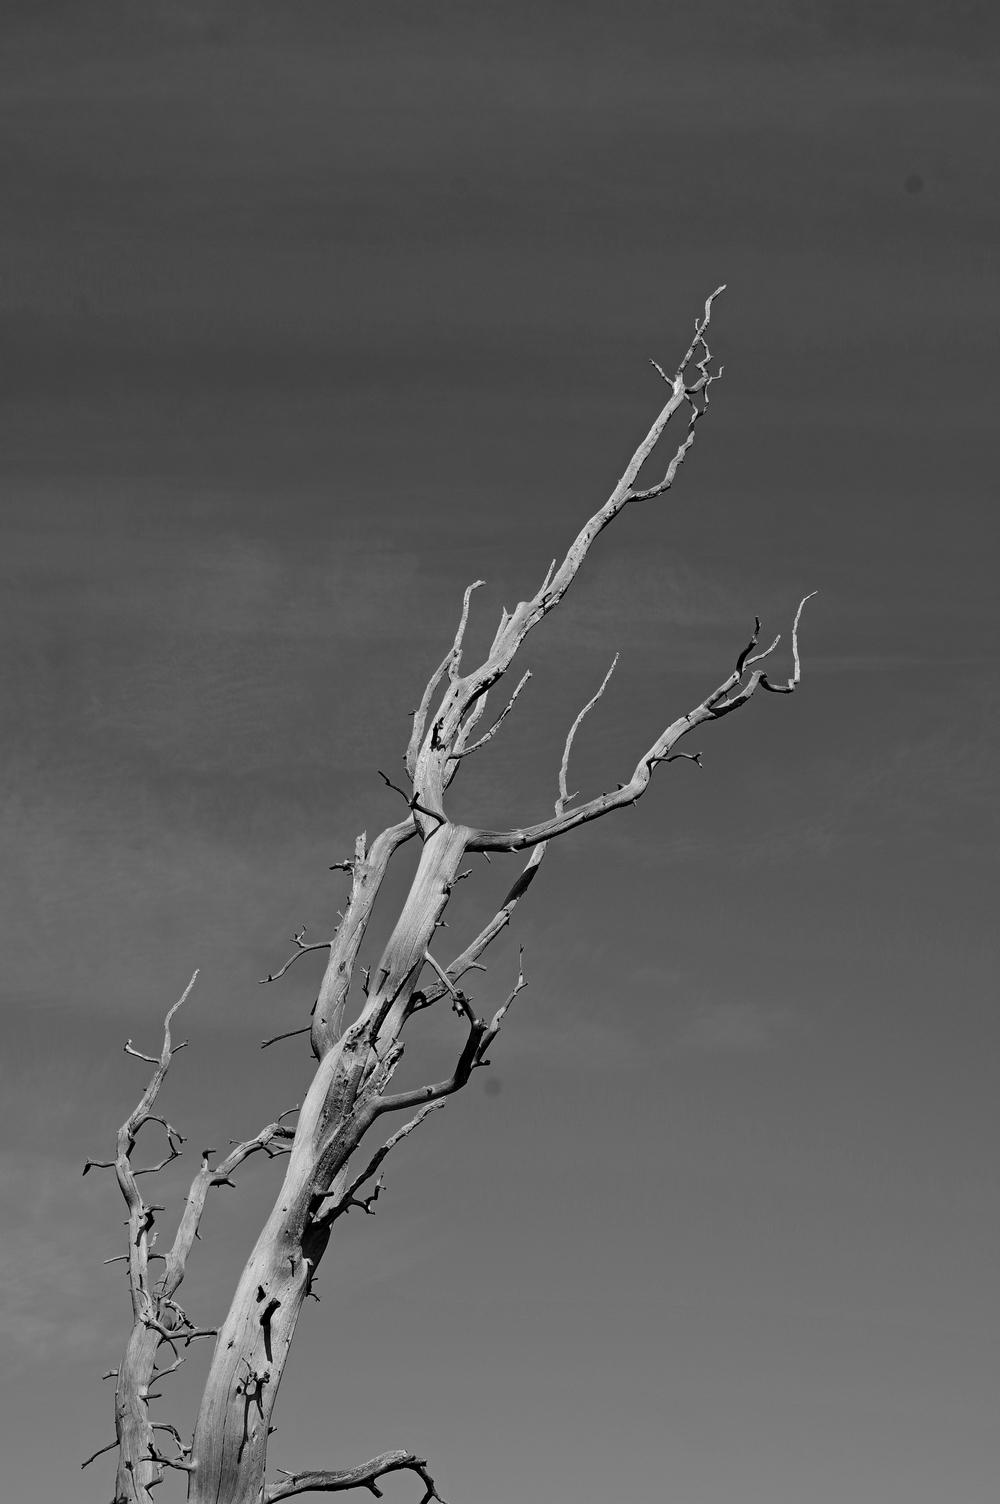 arbre à son dernier repos